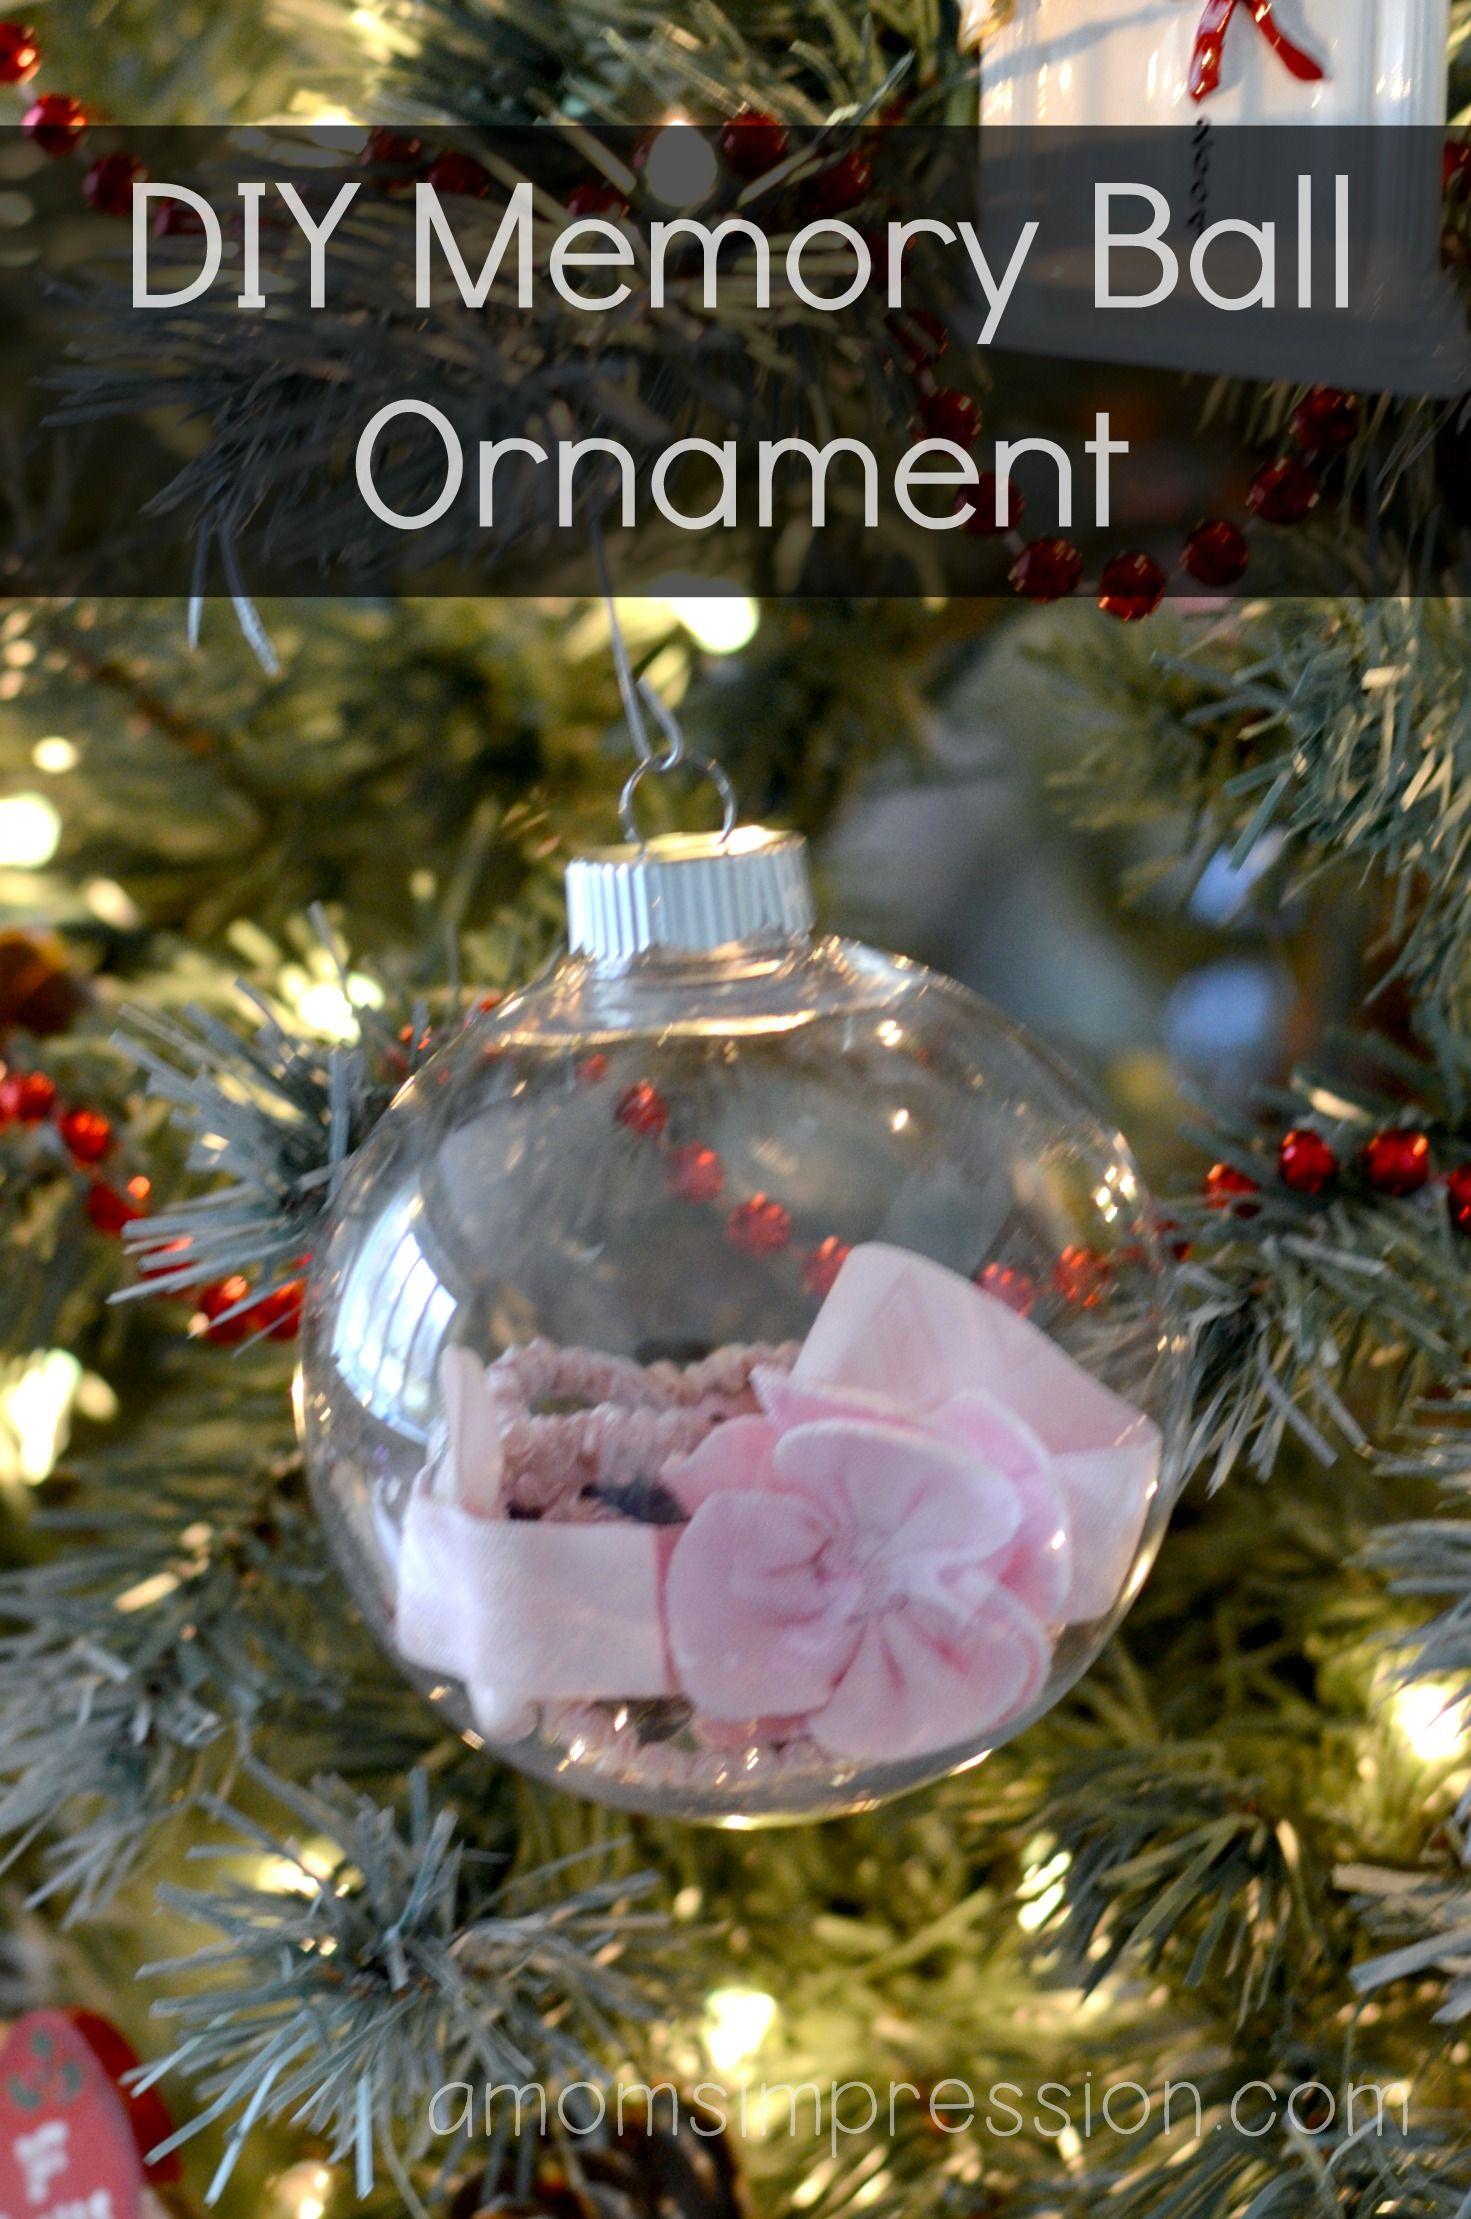 Diy Memory Ball Ornament A Mom S Impression Parenting Recipes Product Reviews Easy Ornaments Ornaments Memorial Ornaments